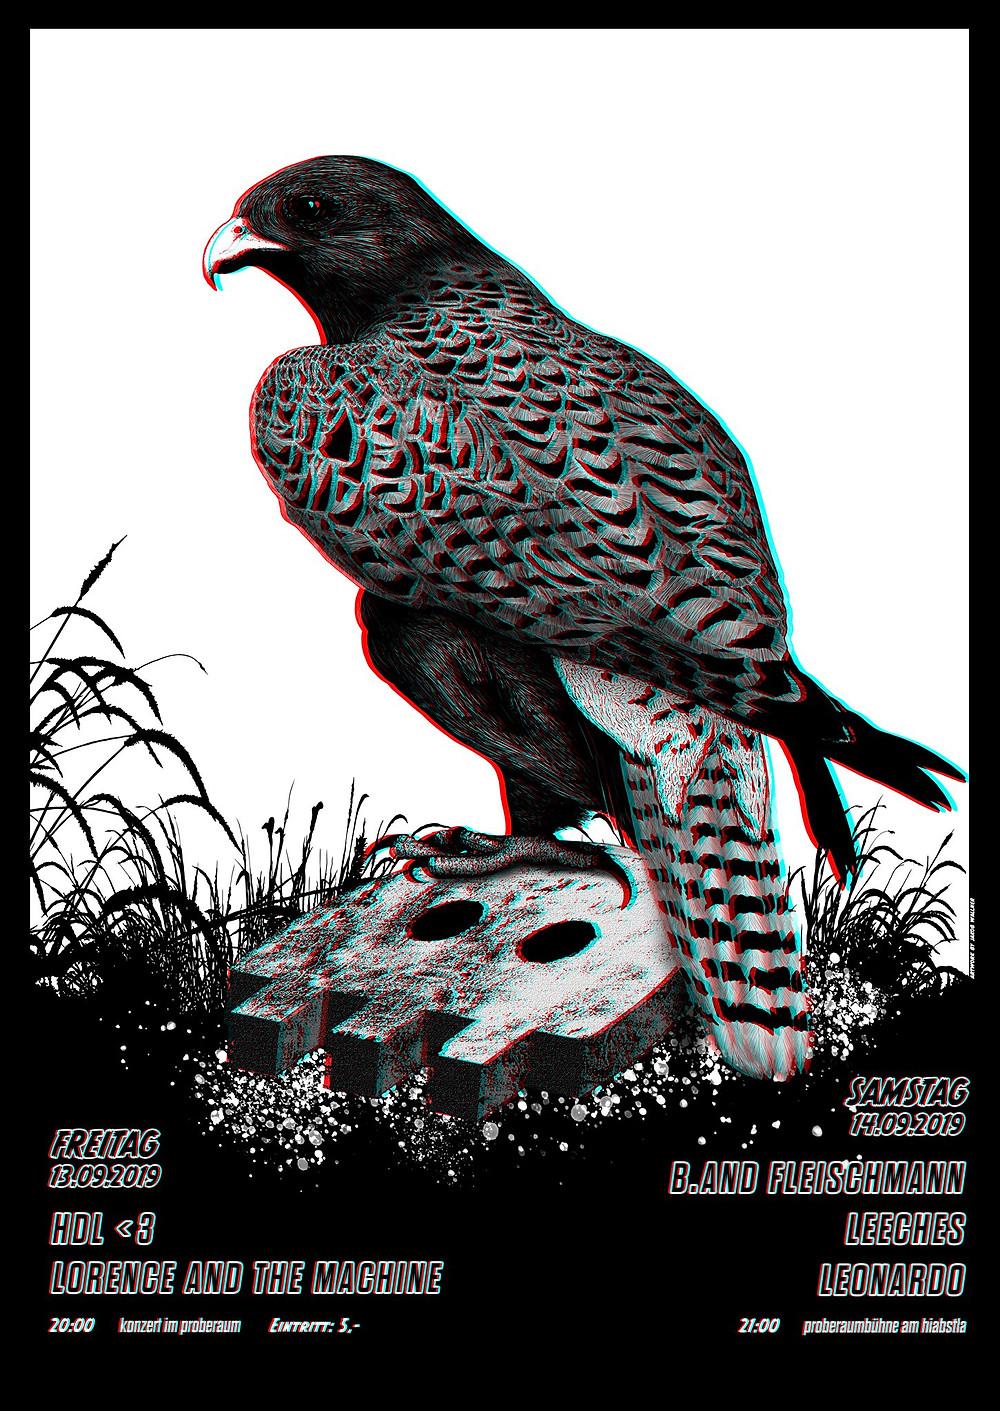 Plakat des Scheibbser Hiabstla 2019